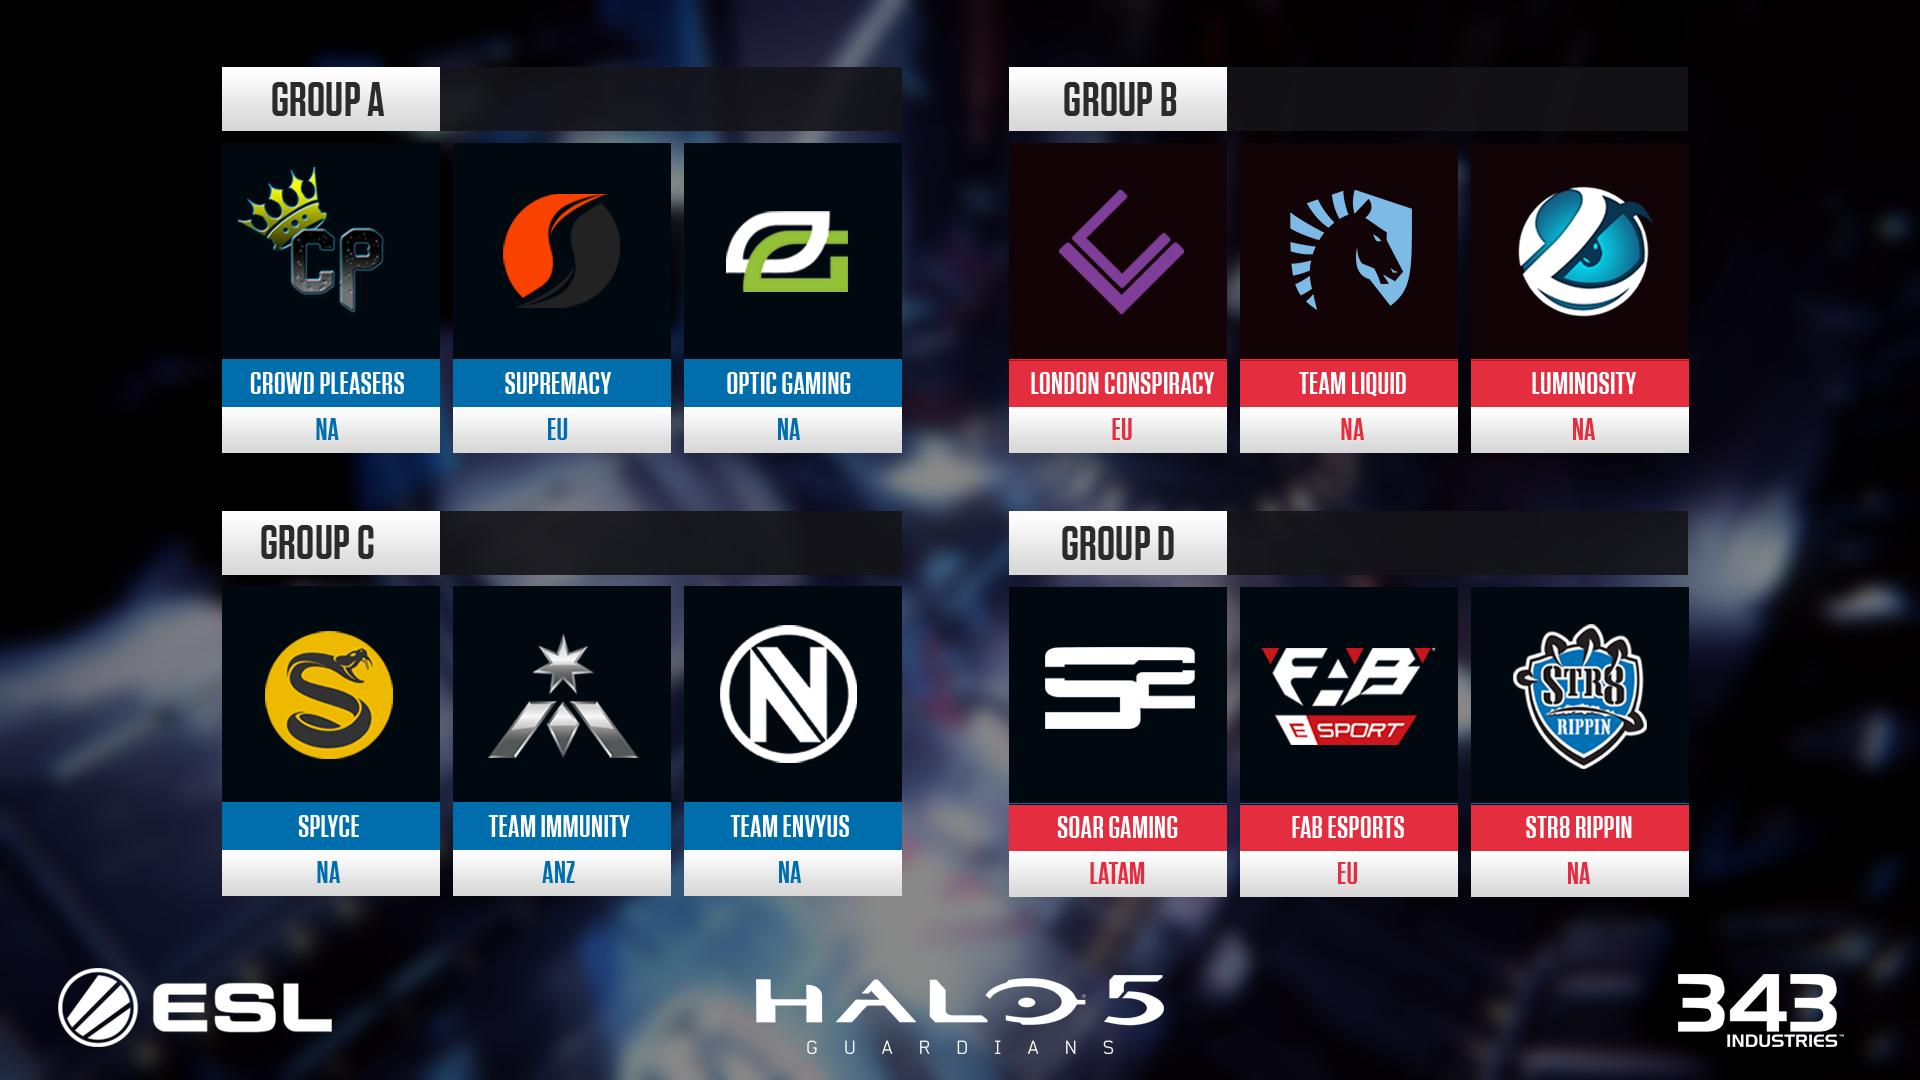 Halo-World-Championship-2017-equipos-frikigamers.com